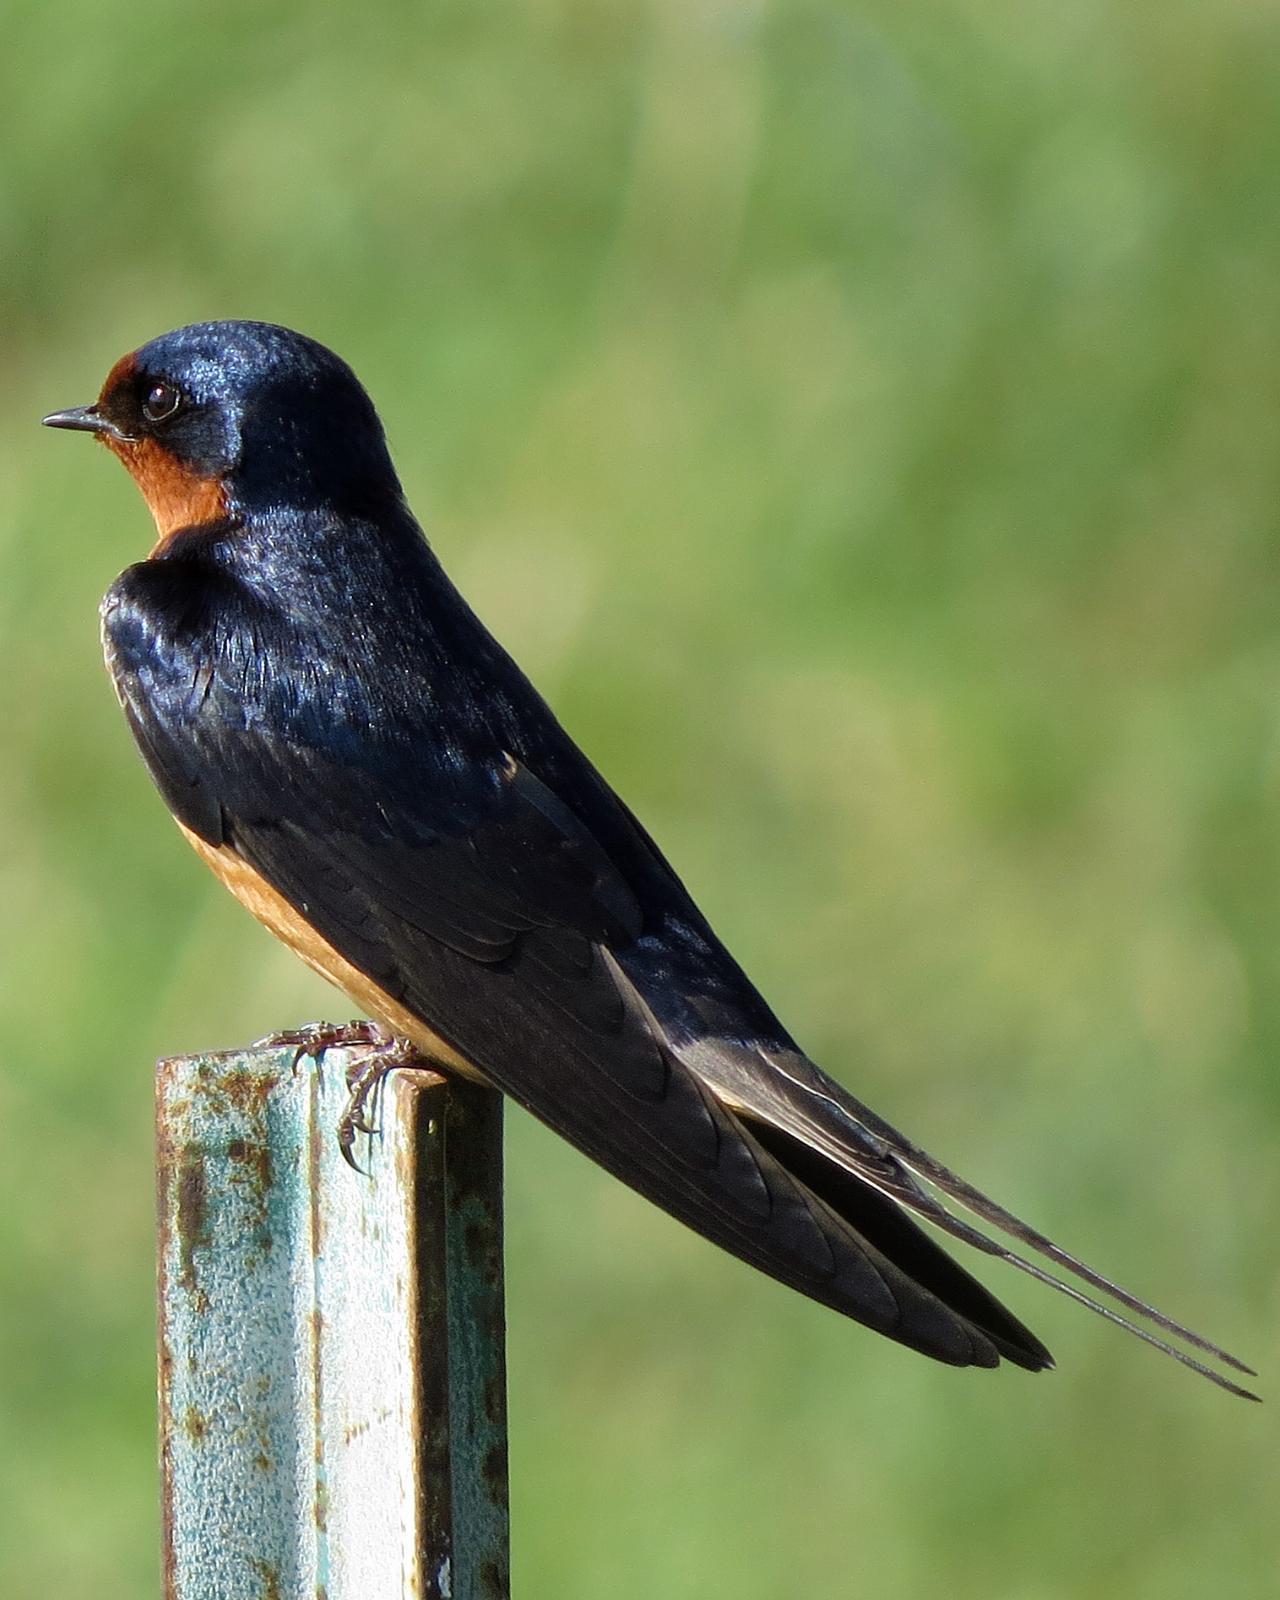 Barn Swallow Photo by Kelly Preheim